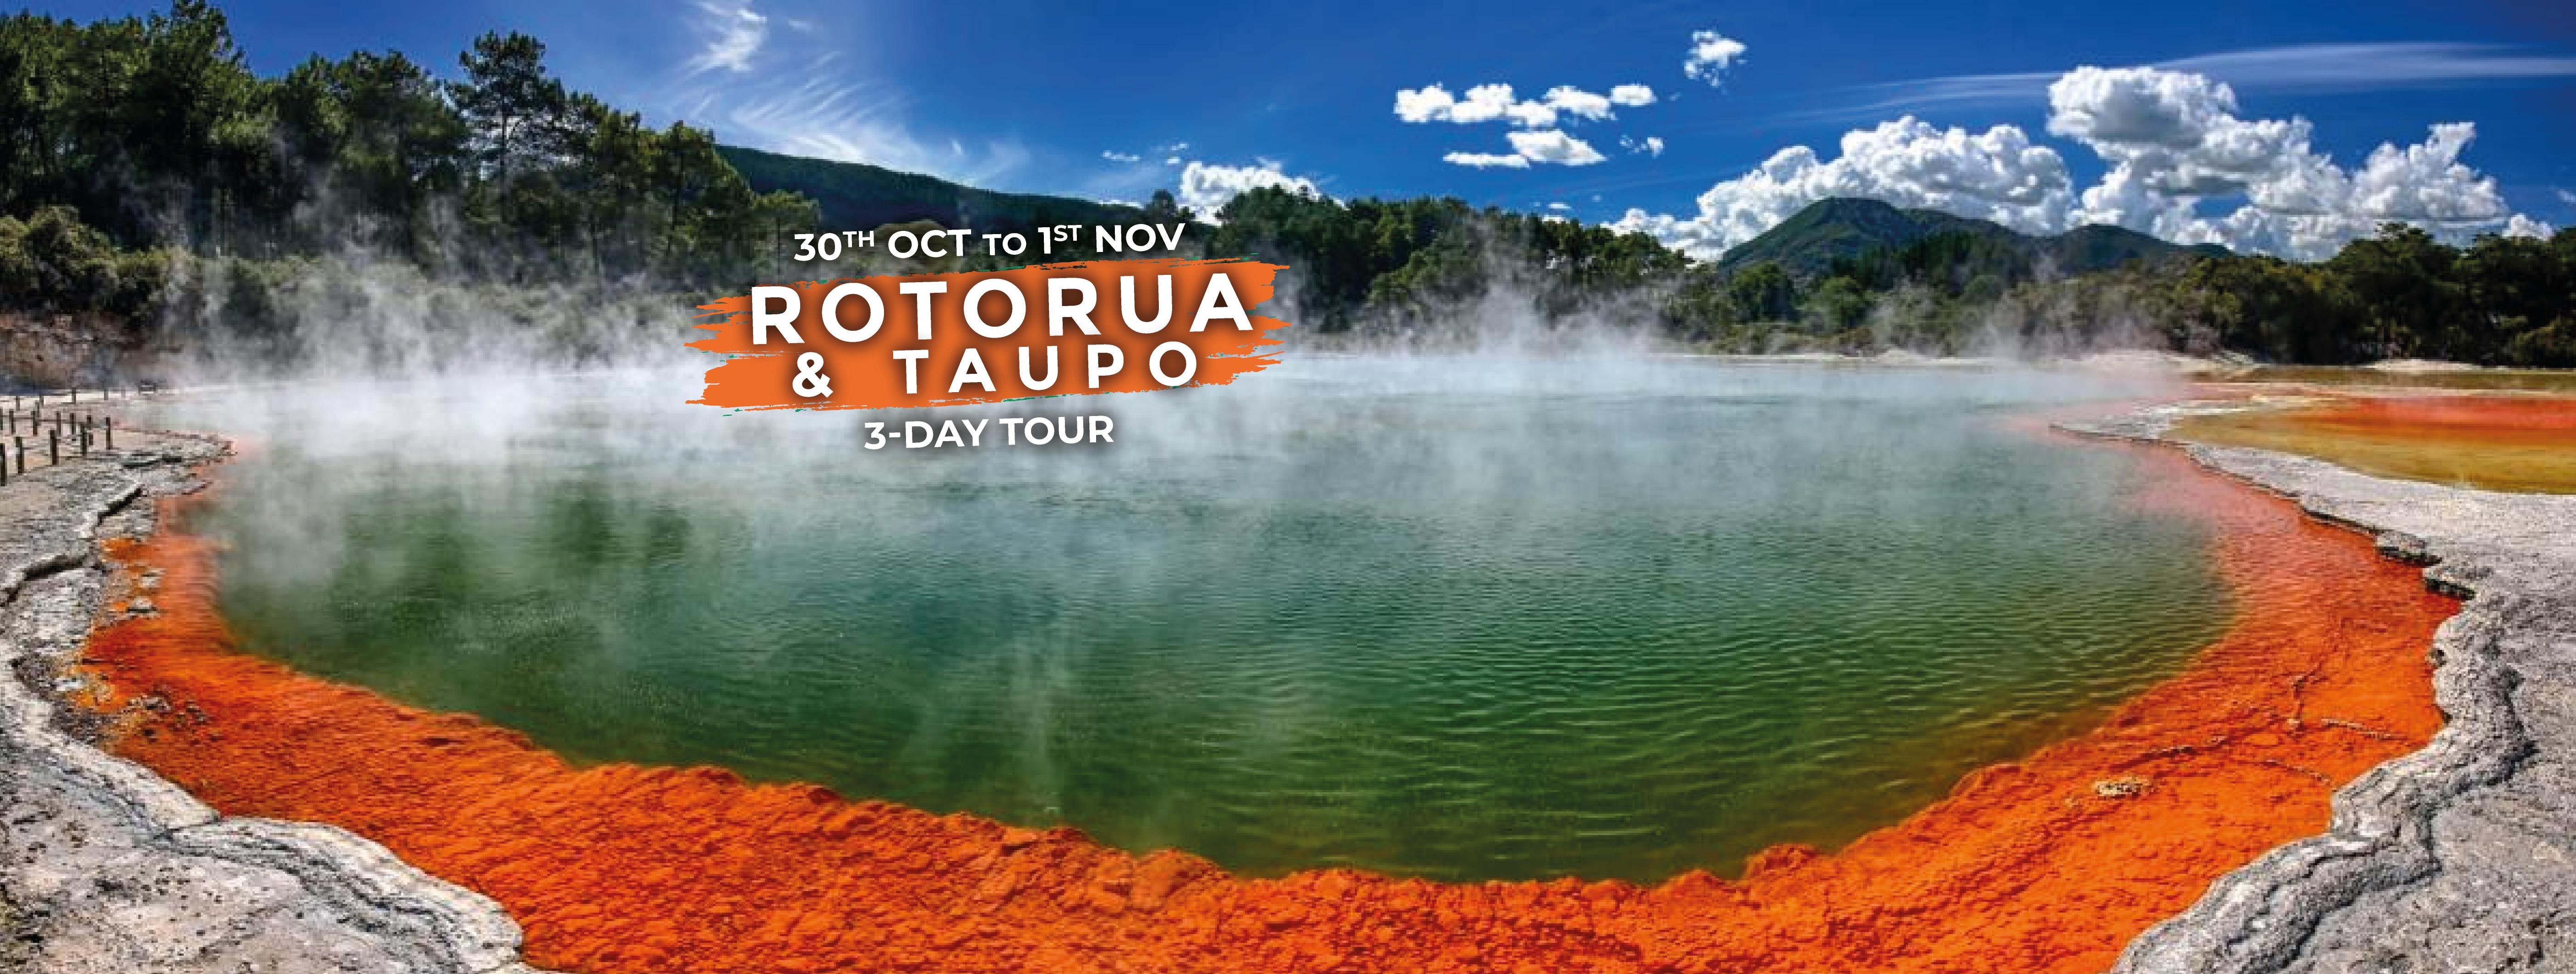 Banner Website Rotorua 30th oct-01